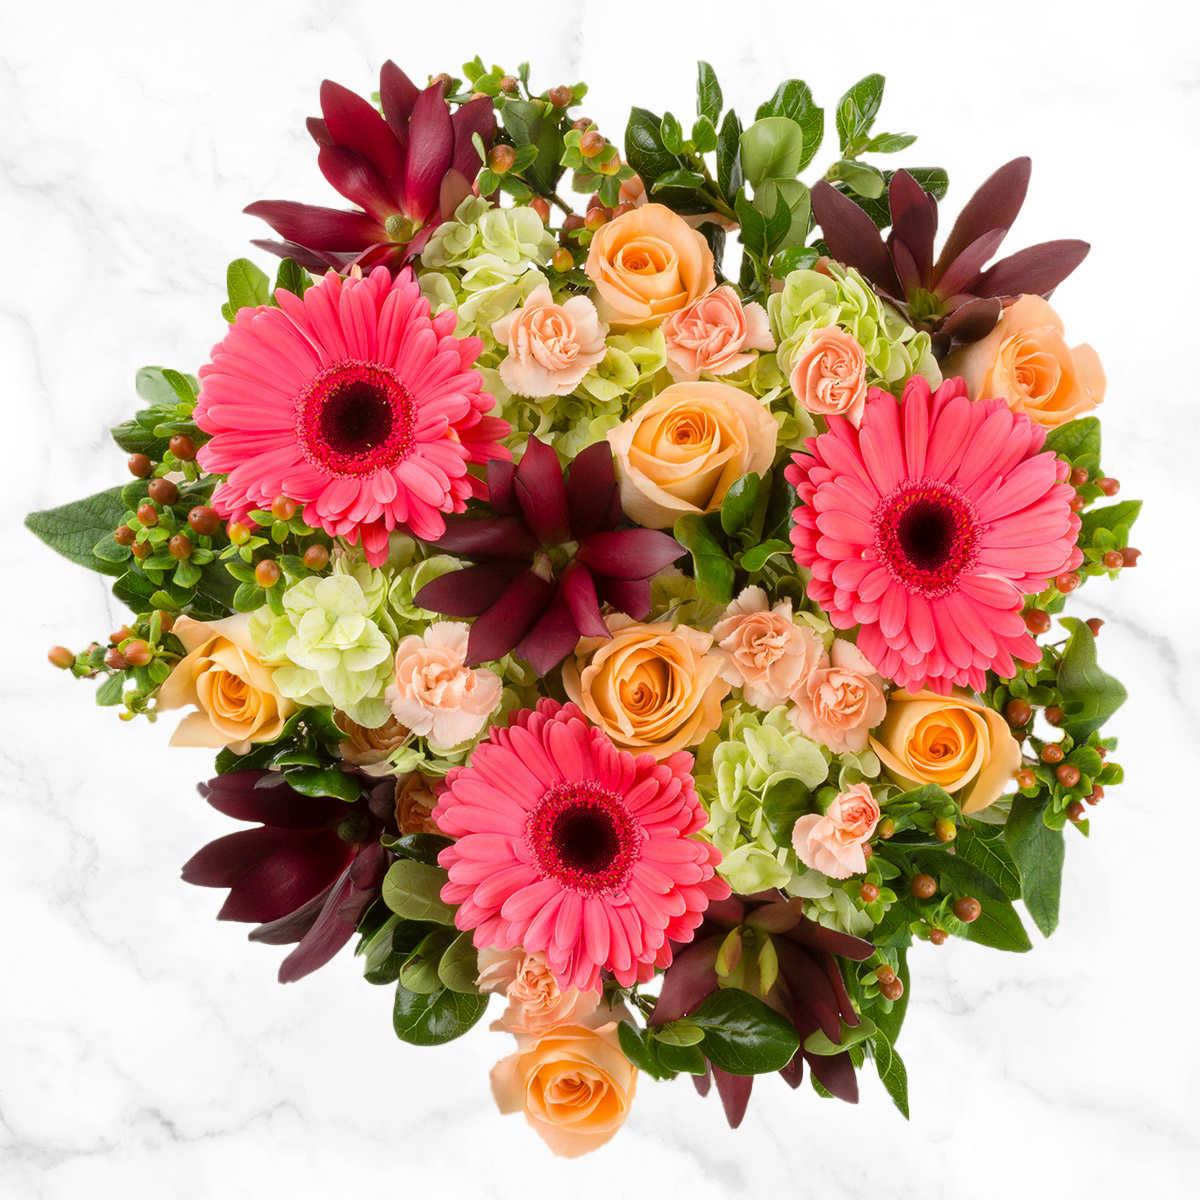 Pink Daisy Floral Bouquet